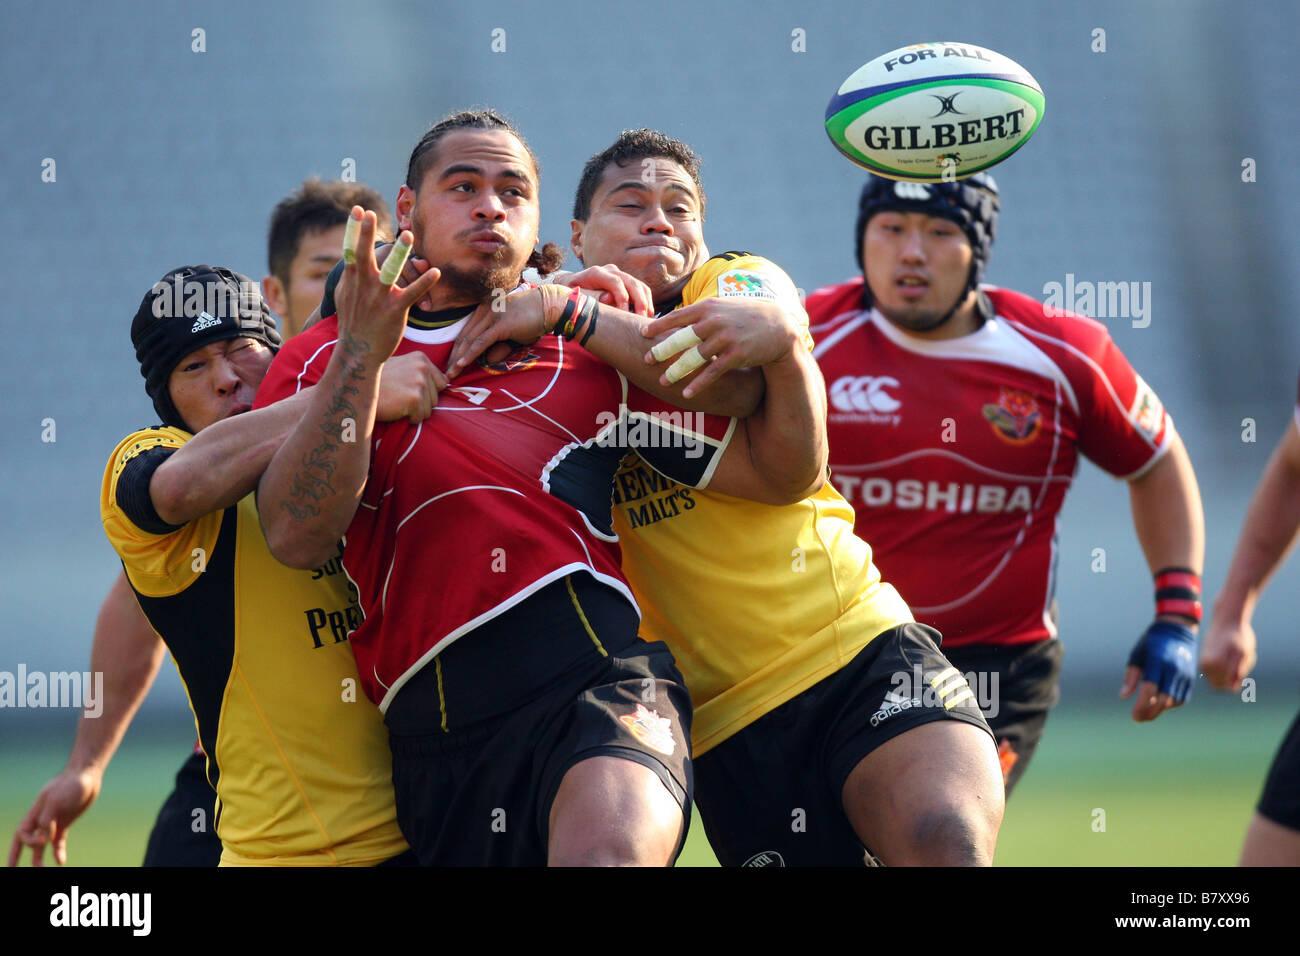 Christian Loamanu TOSHIBA 12 gennaio 2009 Rugby Giappone Top Rugby League 2008 2009 XII Sec match tra SUNTORY Sungoliath Immagini Stock